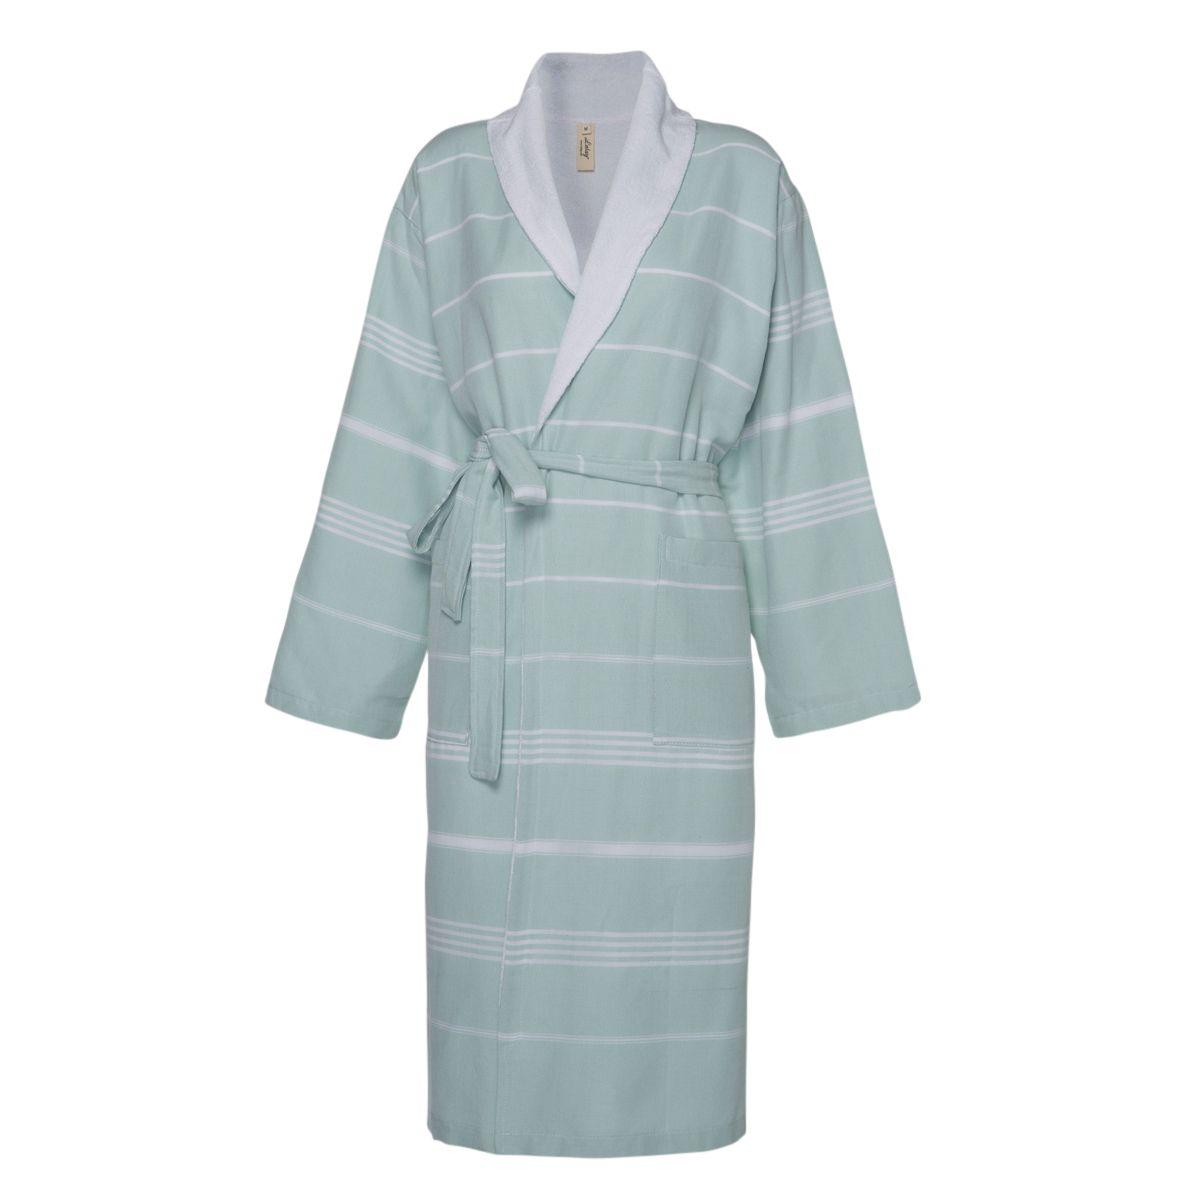 Bathrobe Leyla / With Towel Lining - Mint